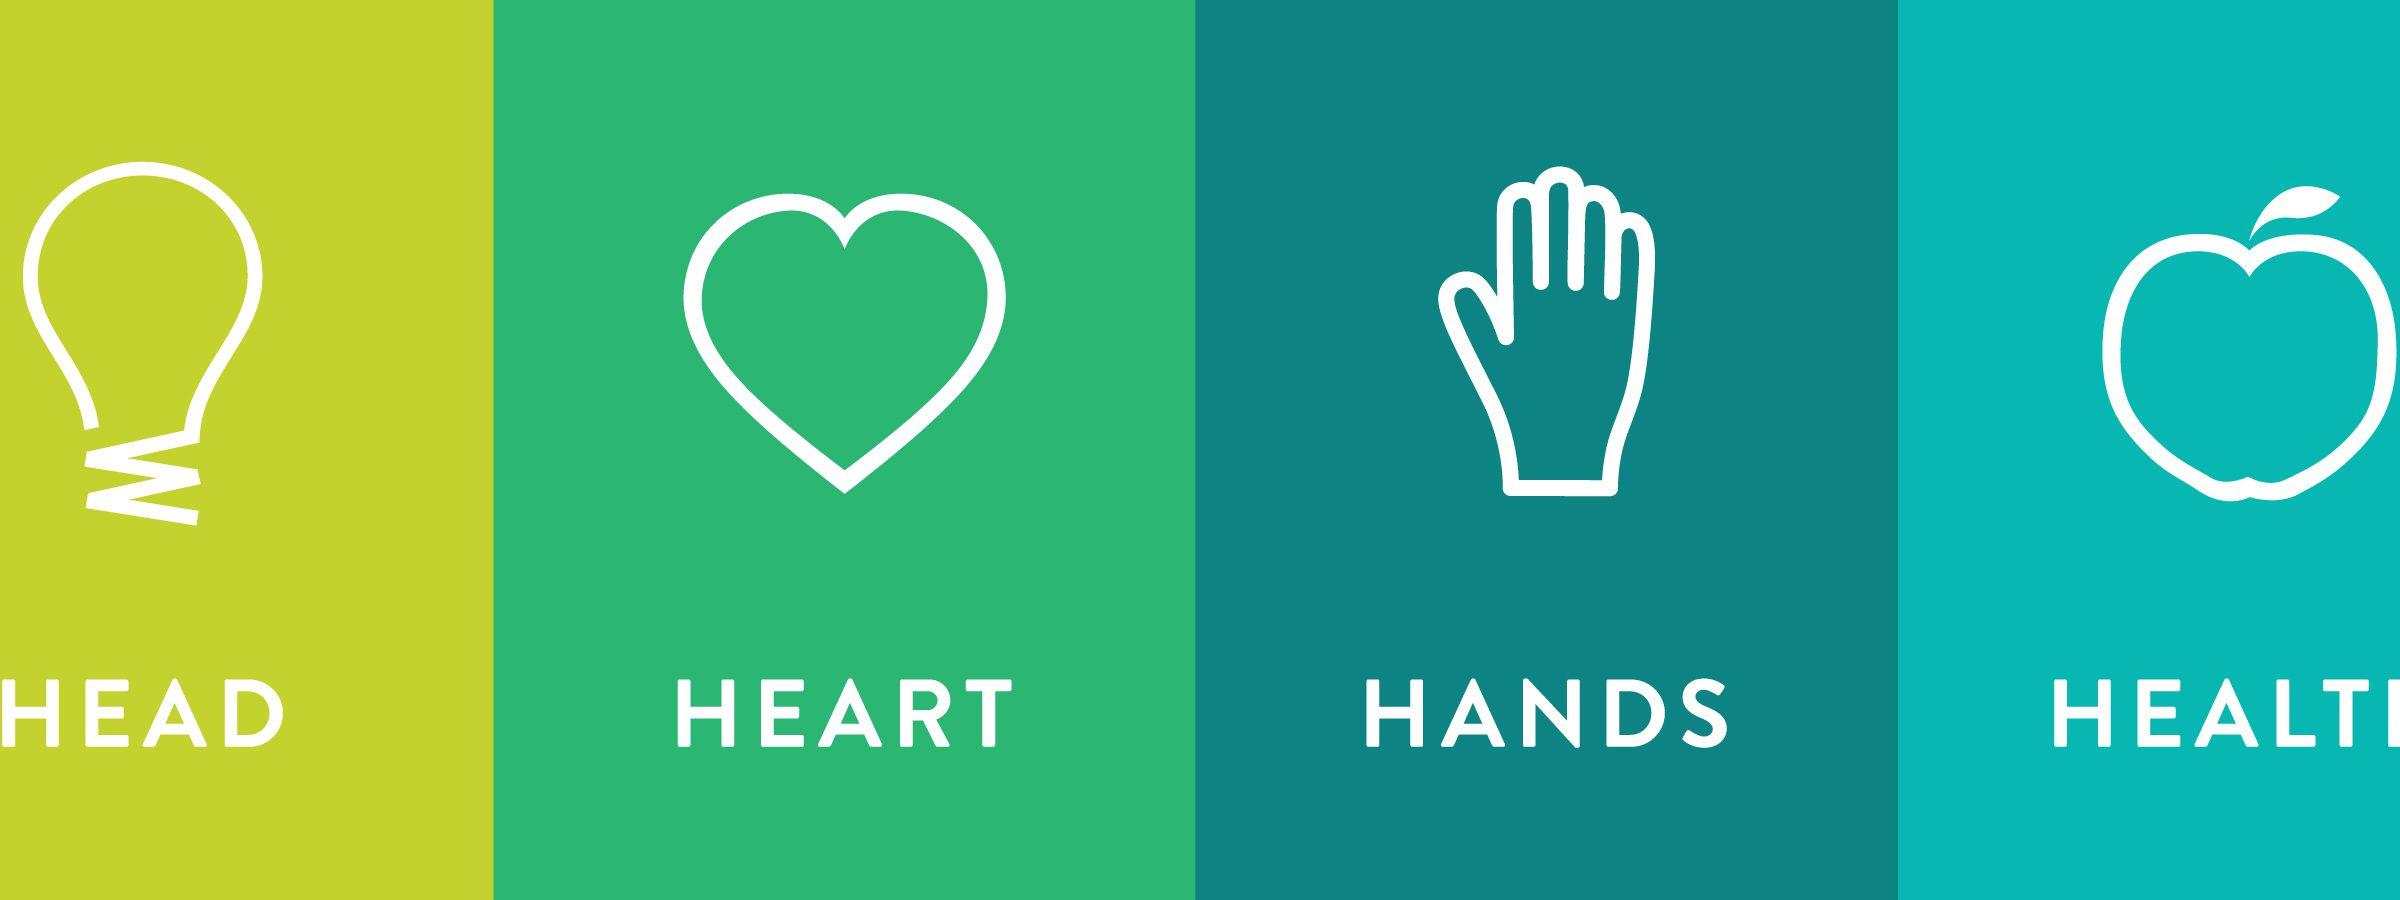 Head Heart hands health banner